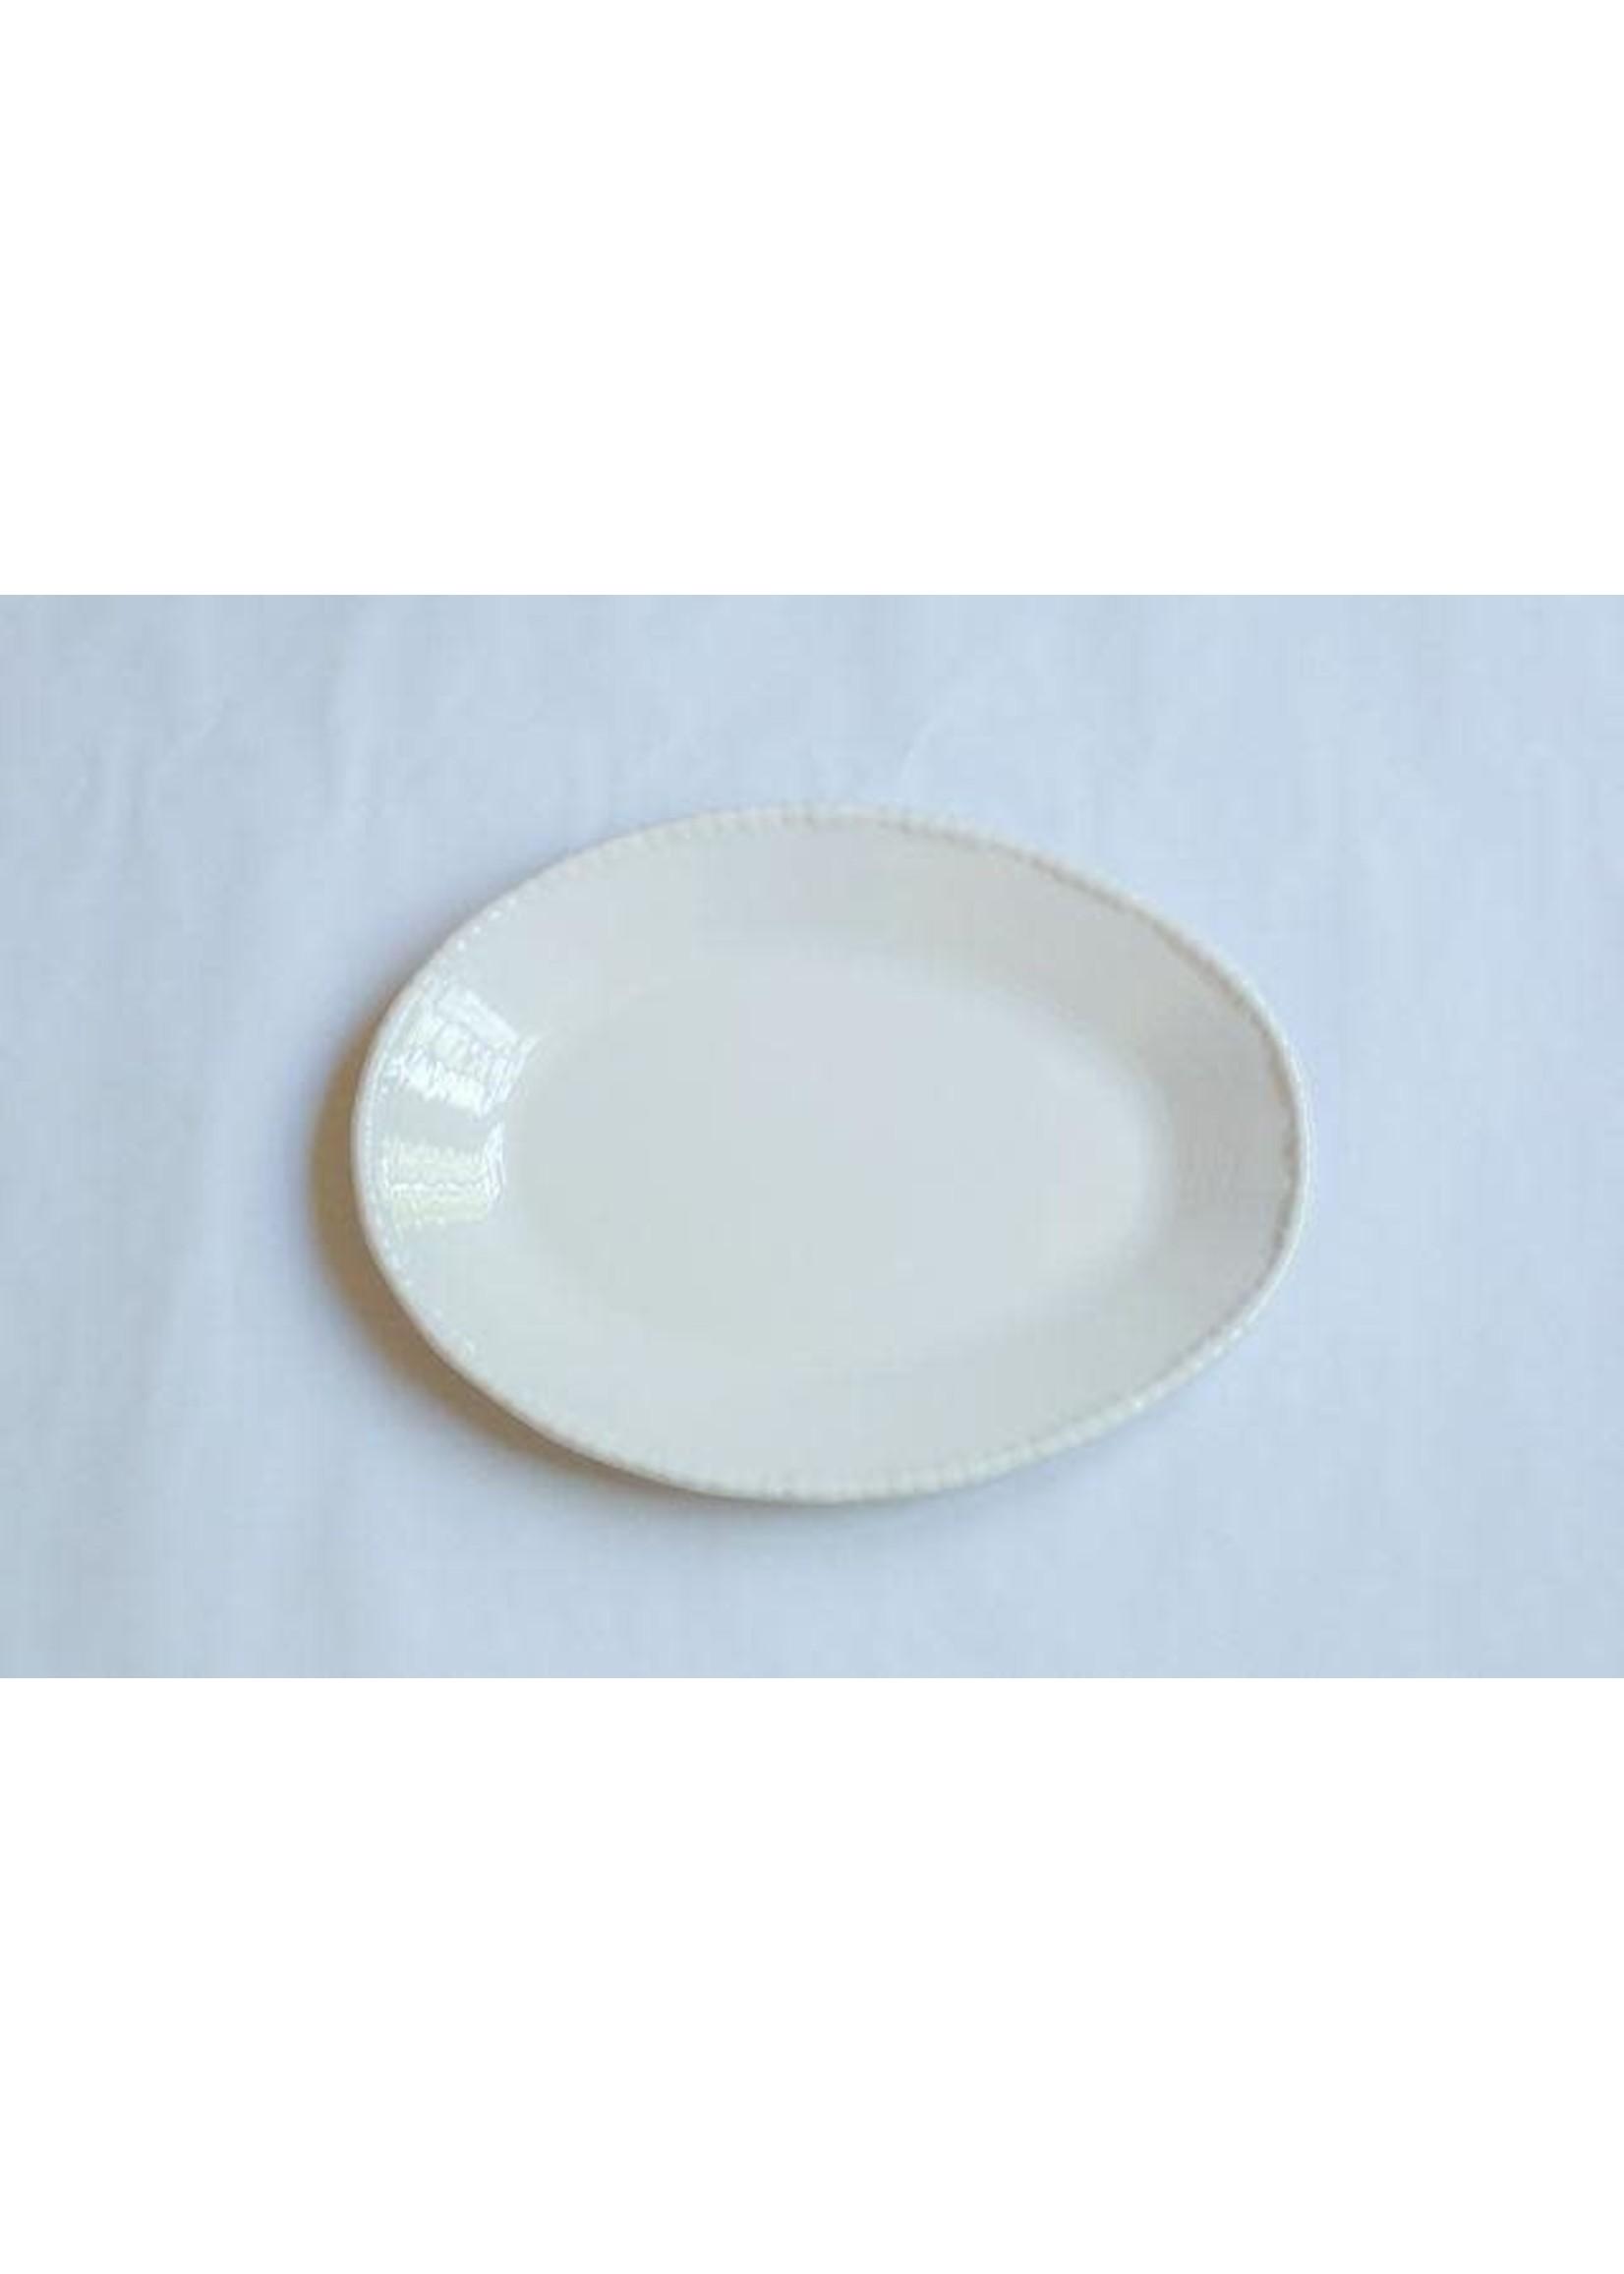 Relish Melamine - Beaded Oval Serving Dish - Cream